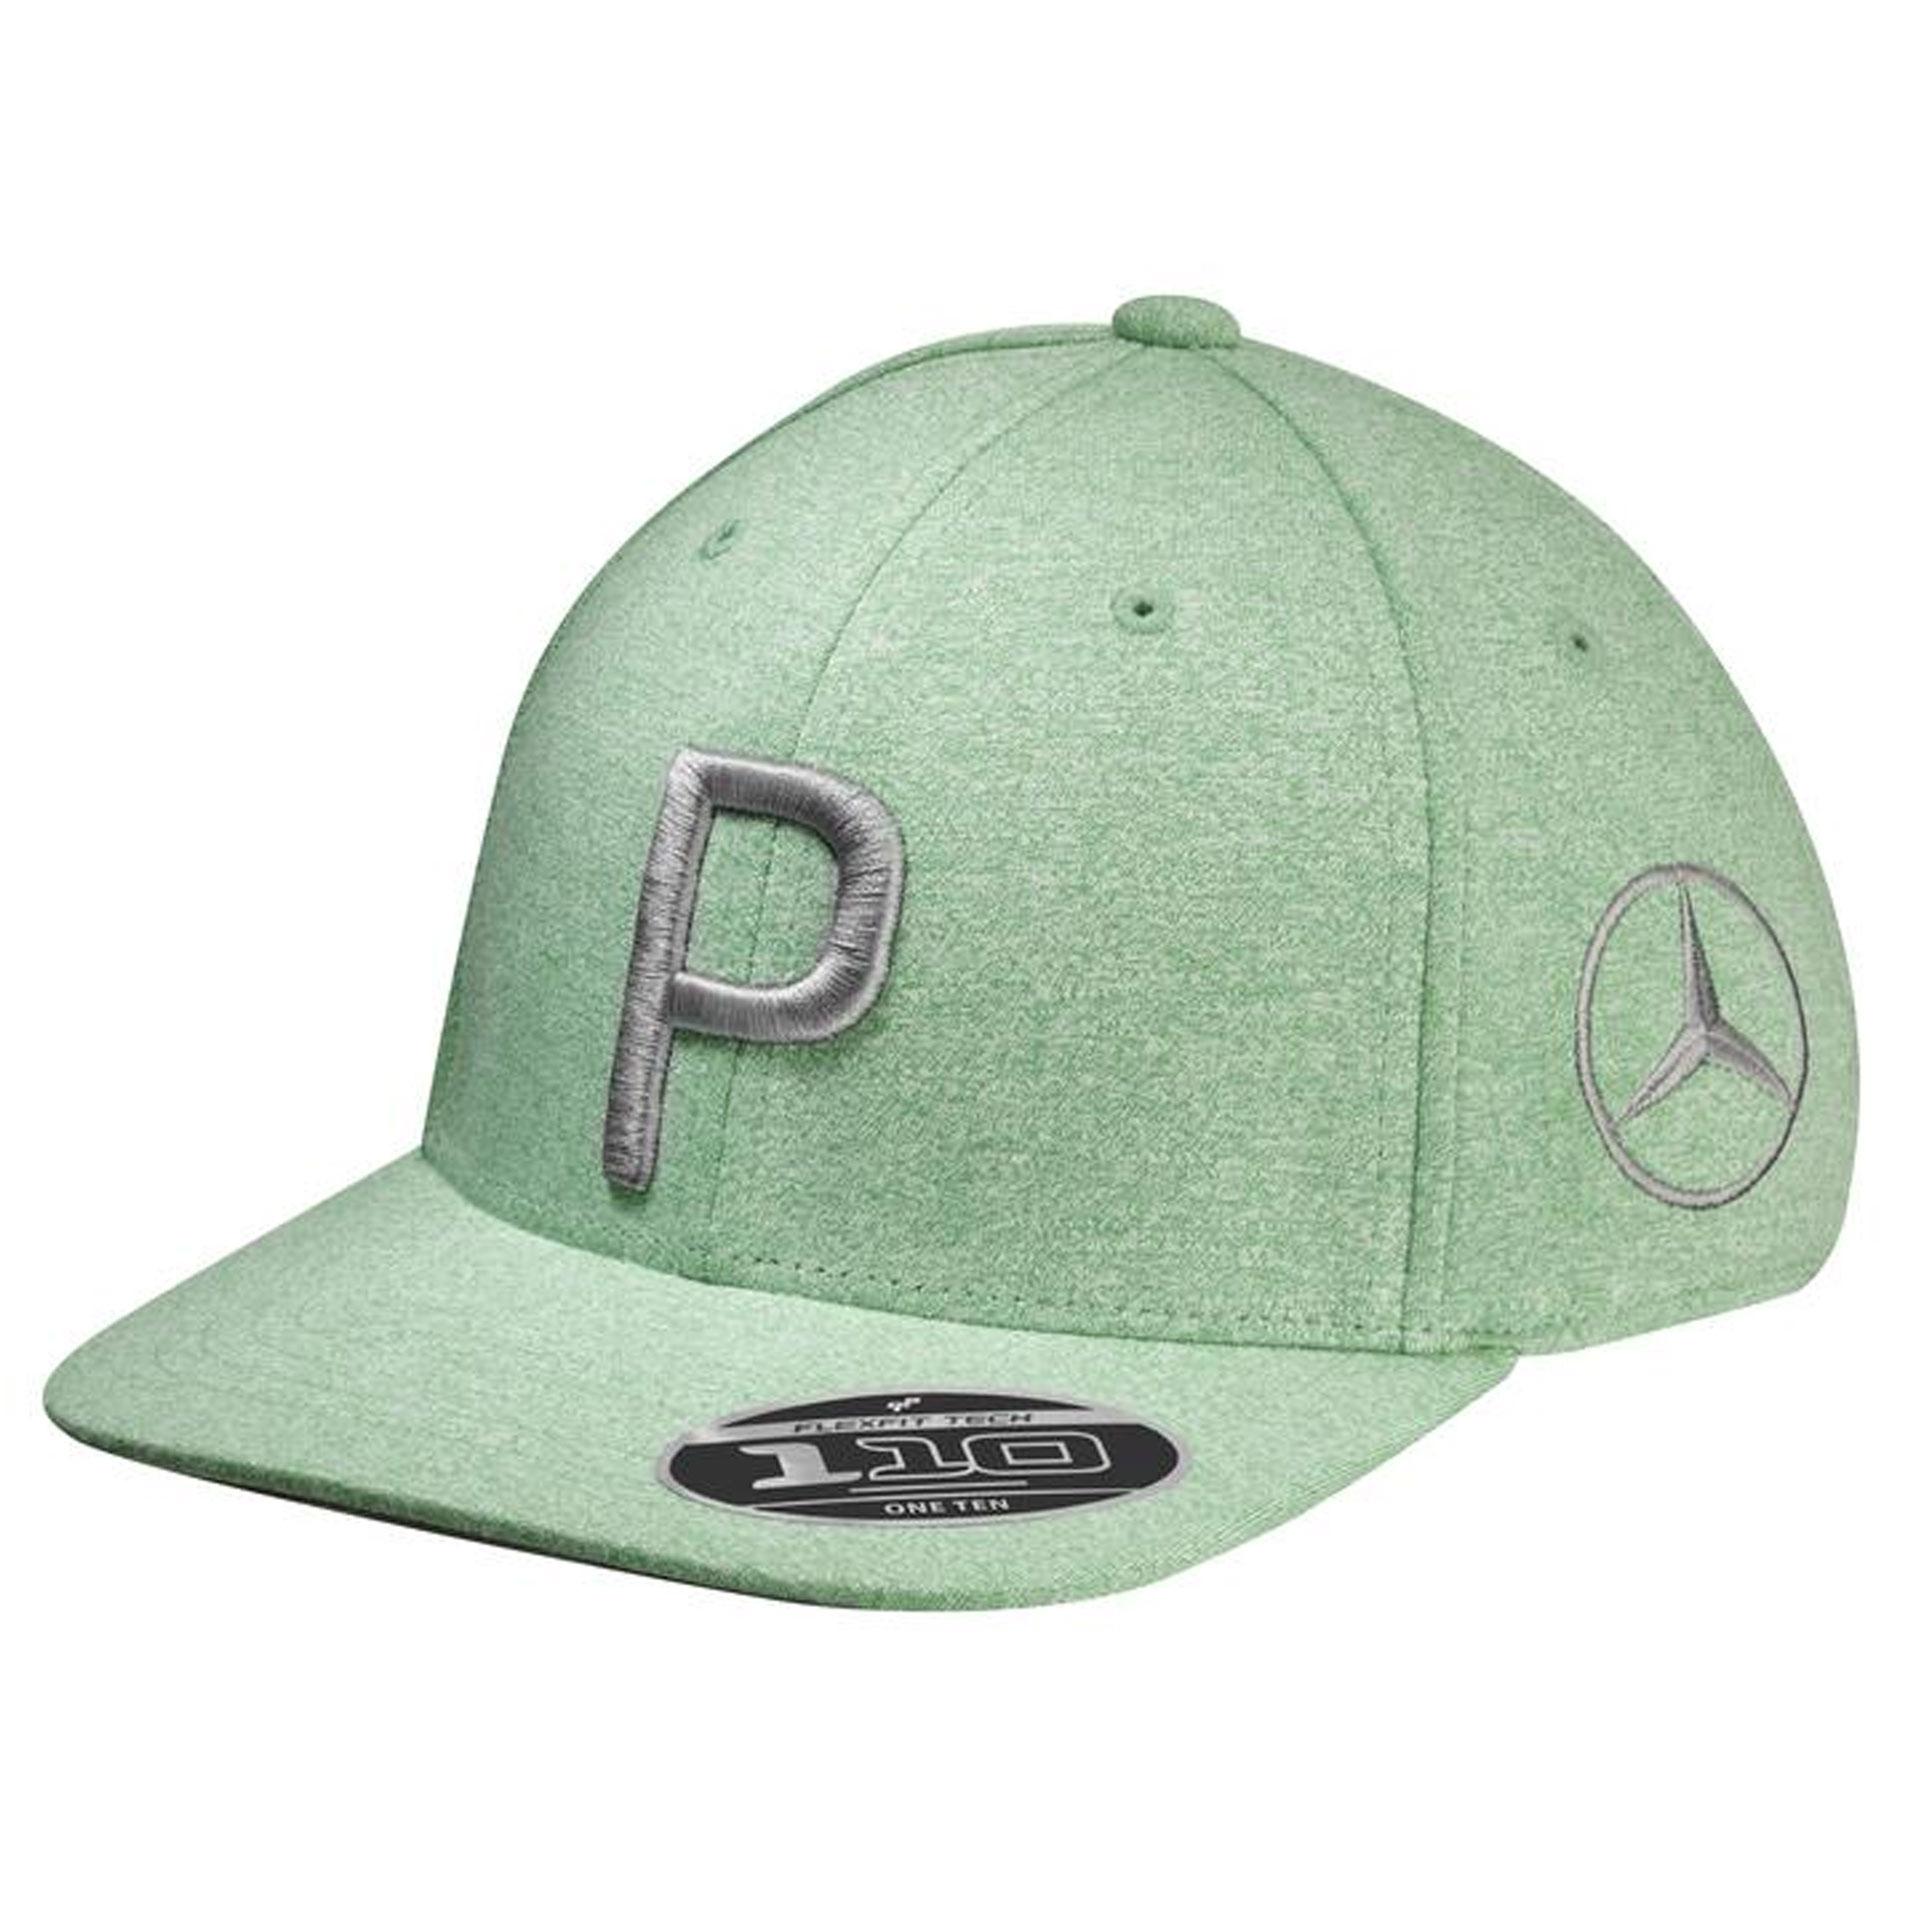 Mercedes-Benz Golf-Cap Kinder grün Basecap Kappe by PUMA